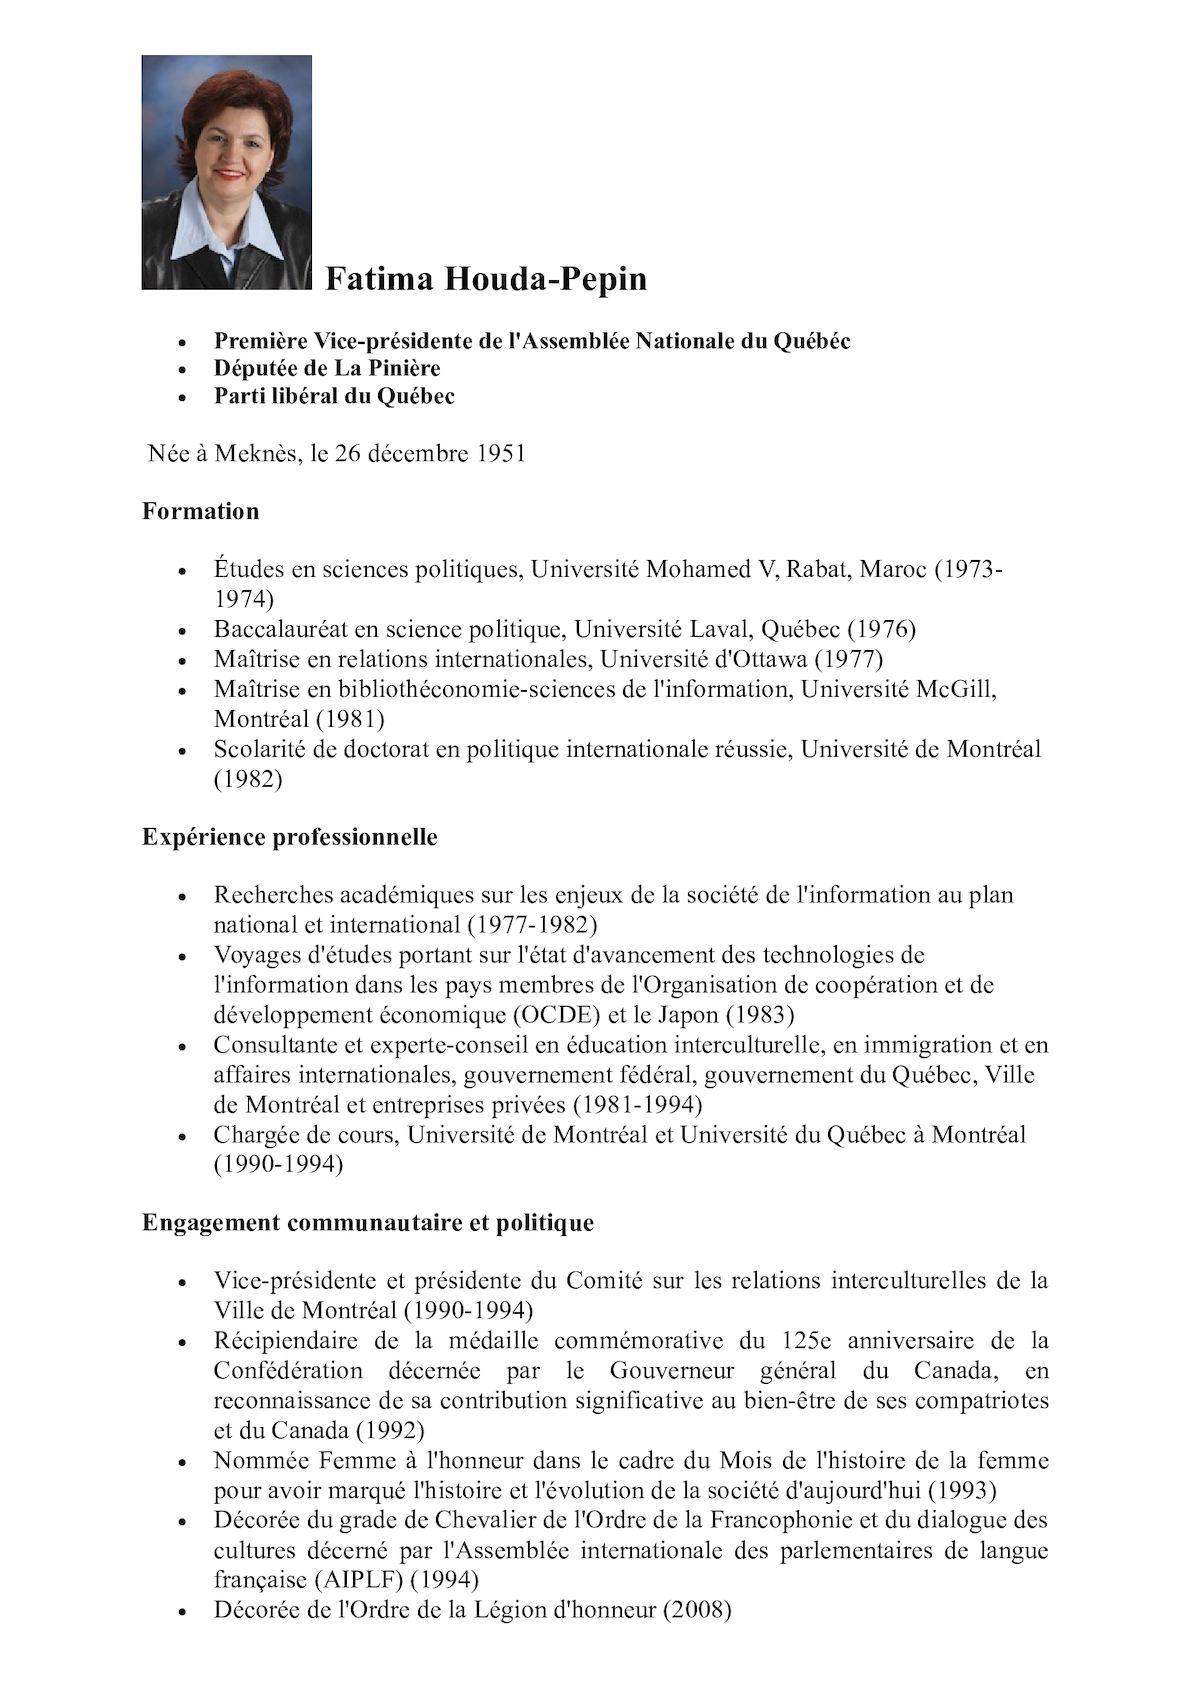 CV Fatima Zahra Peppin